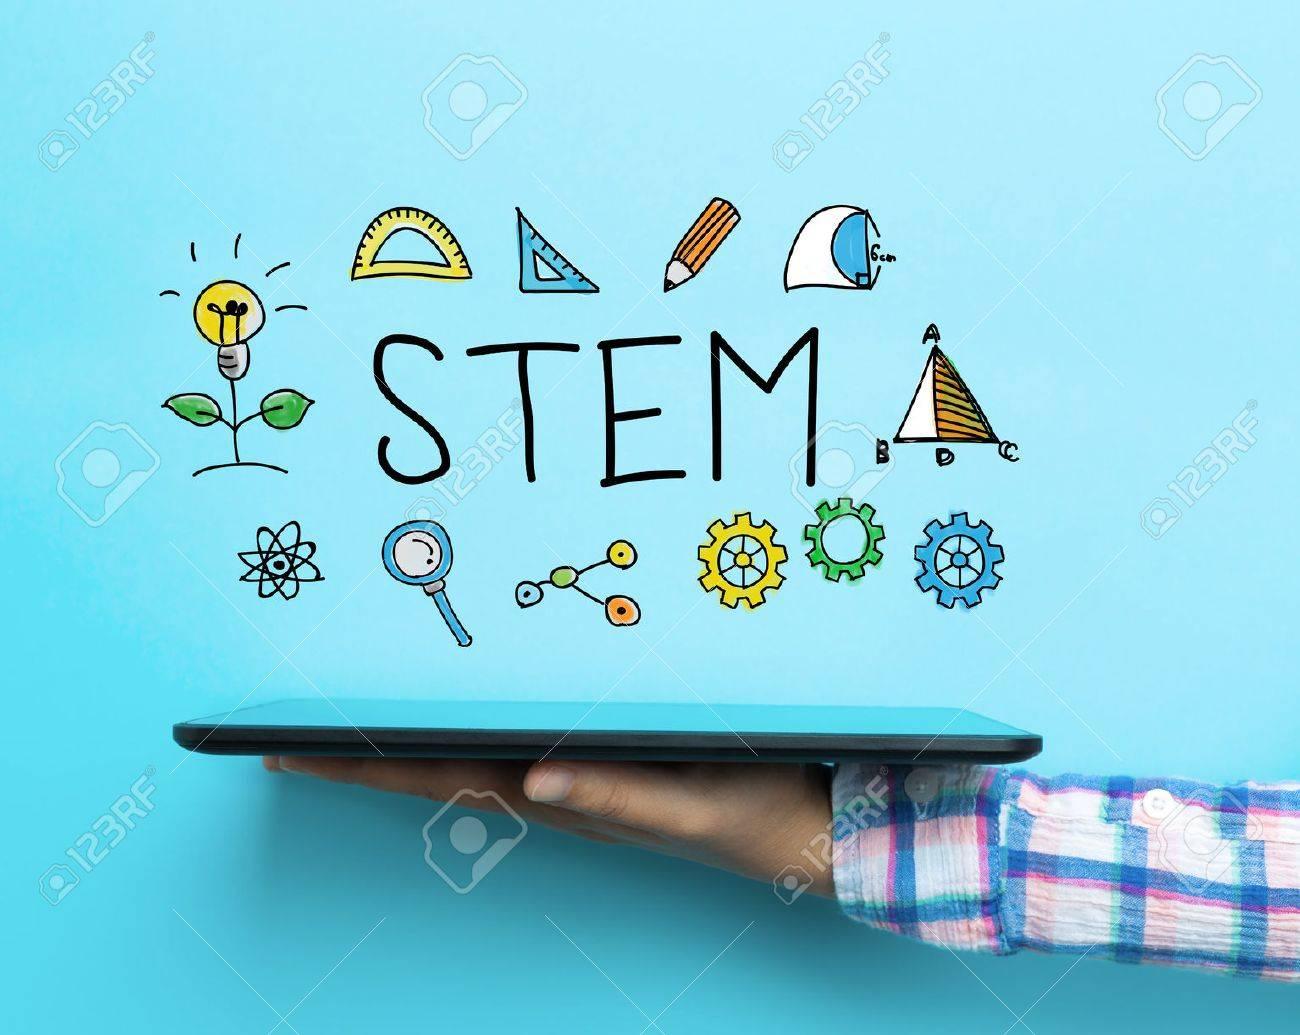 STEM concept with a tablet on blue background Standard-Bild - 63824559